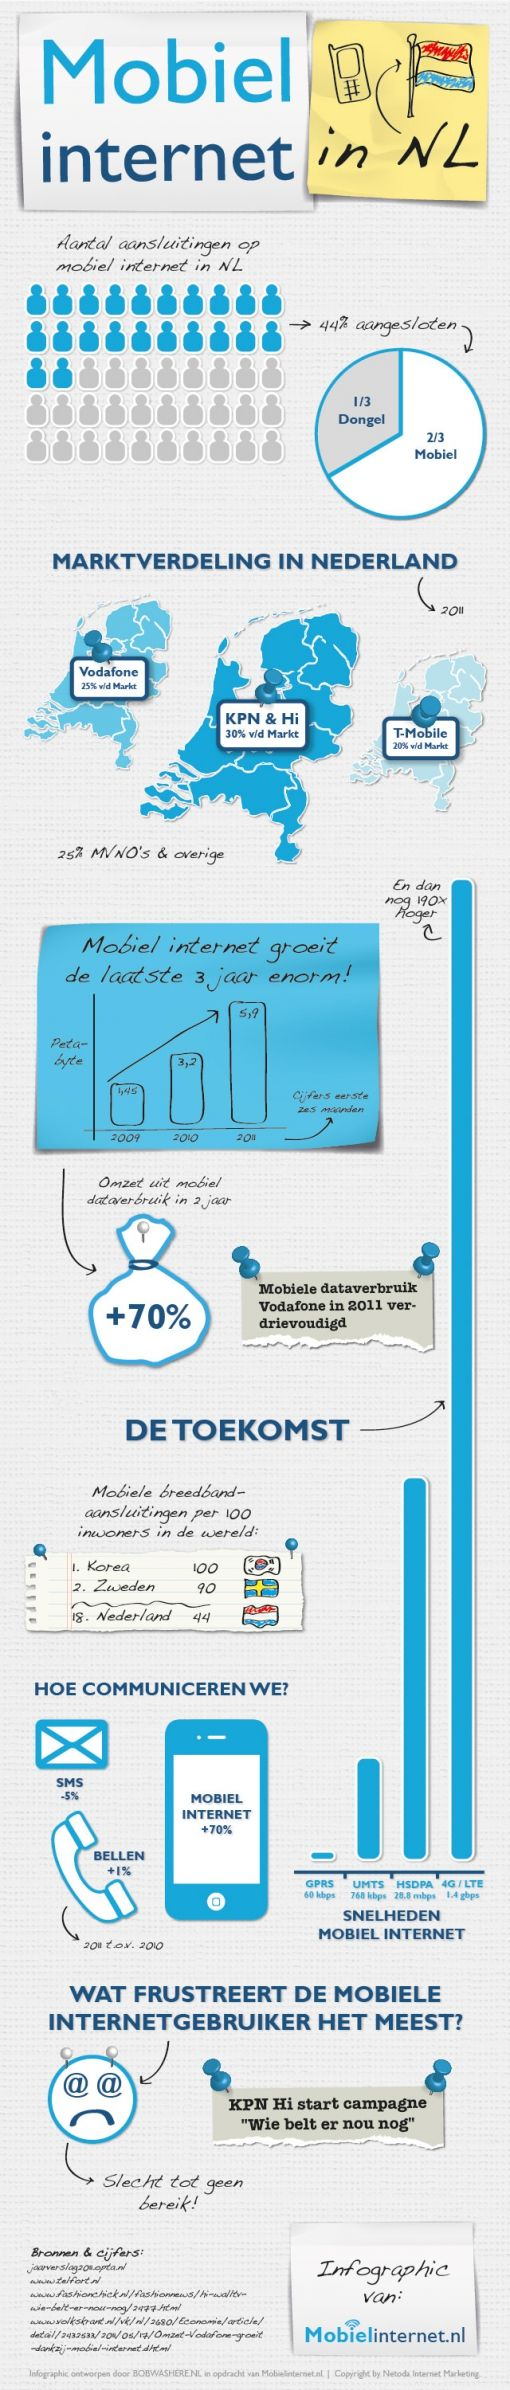 Infographic-Mobiel-Internet-2012